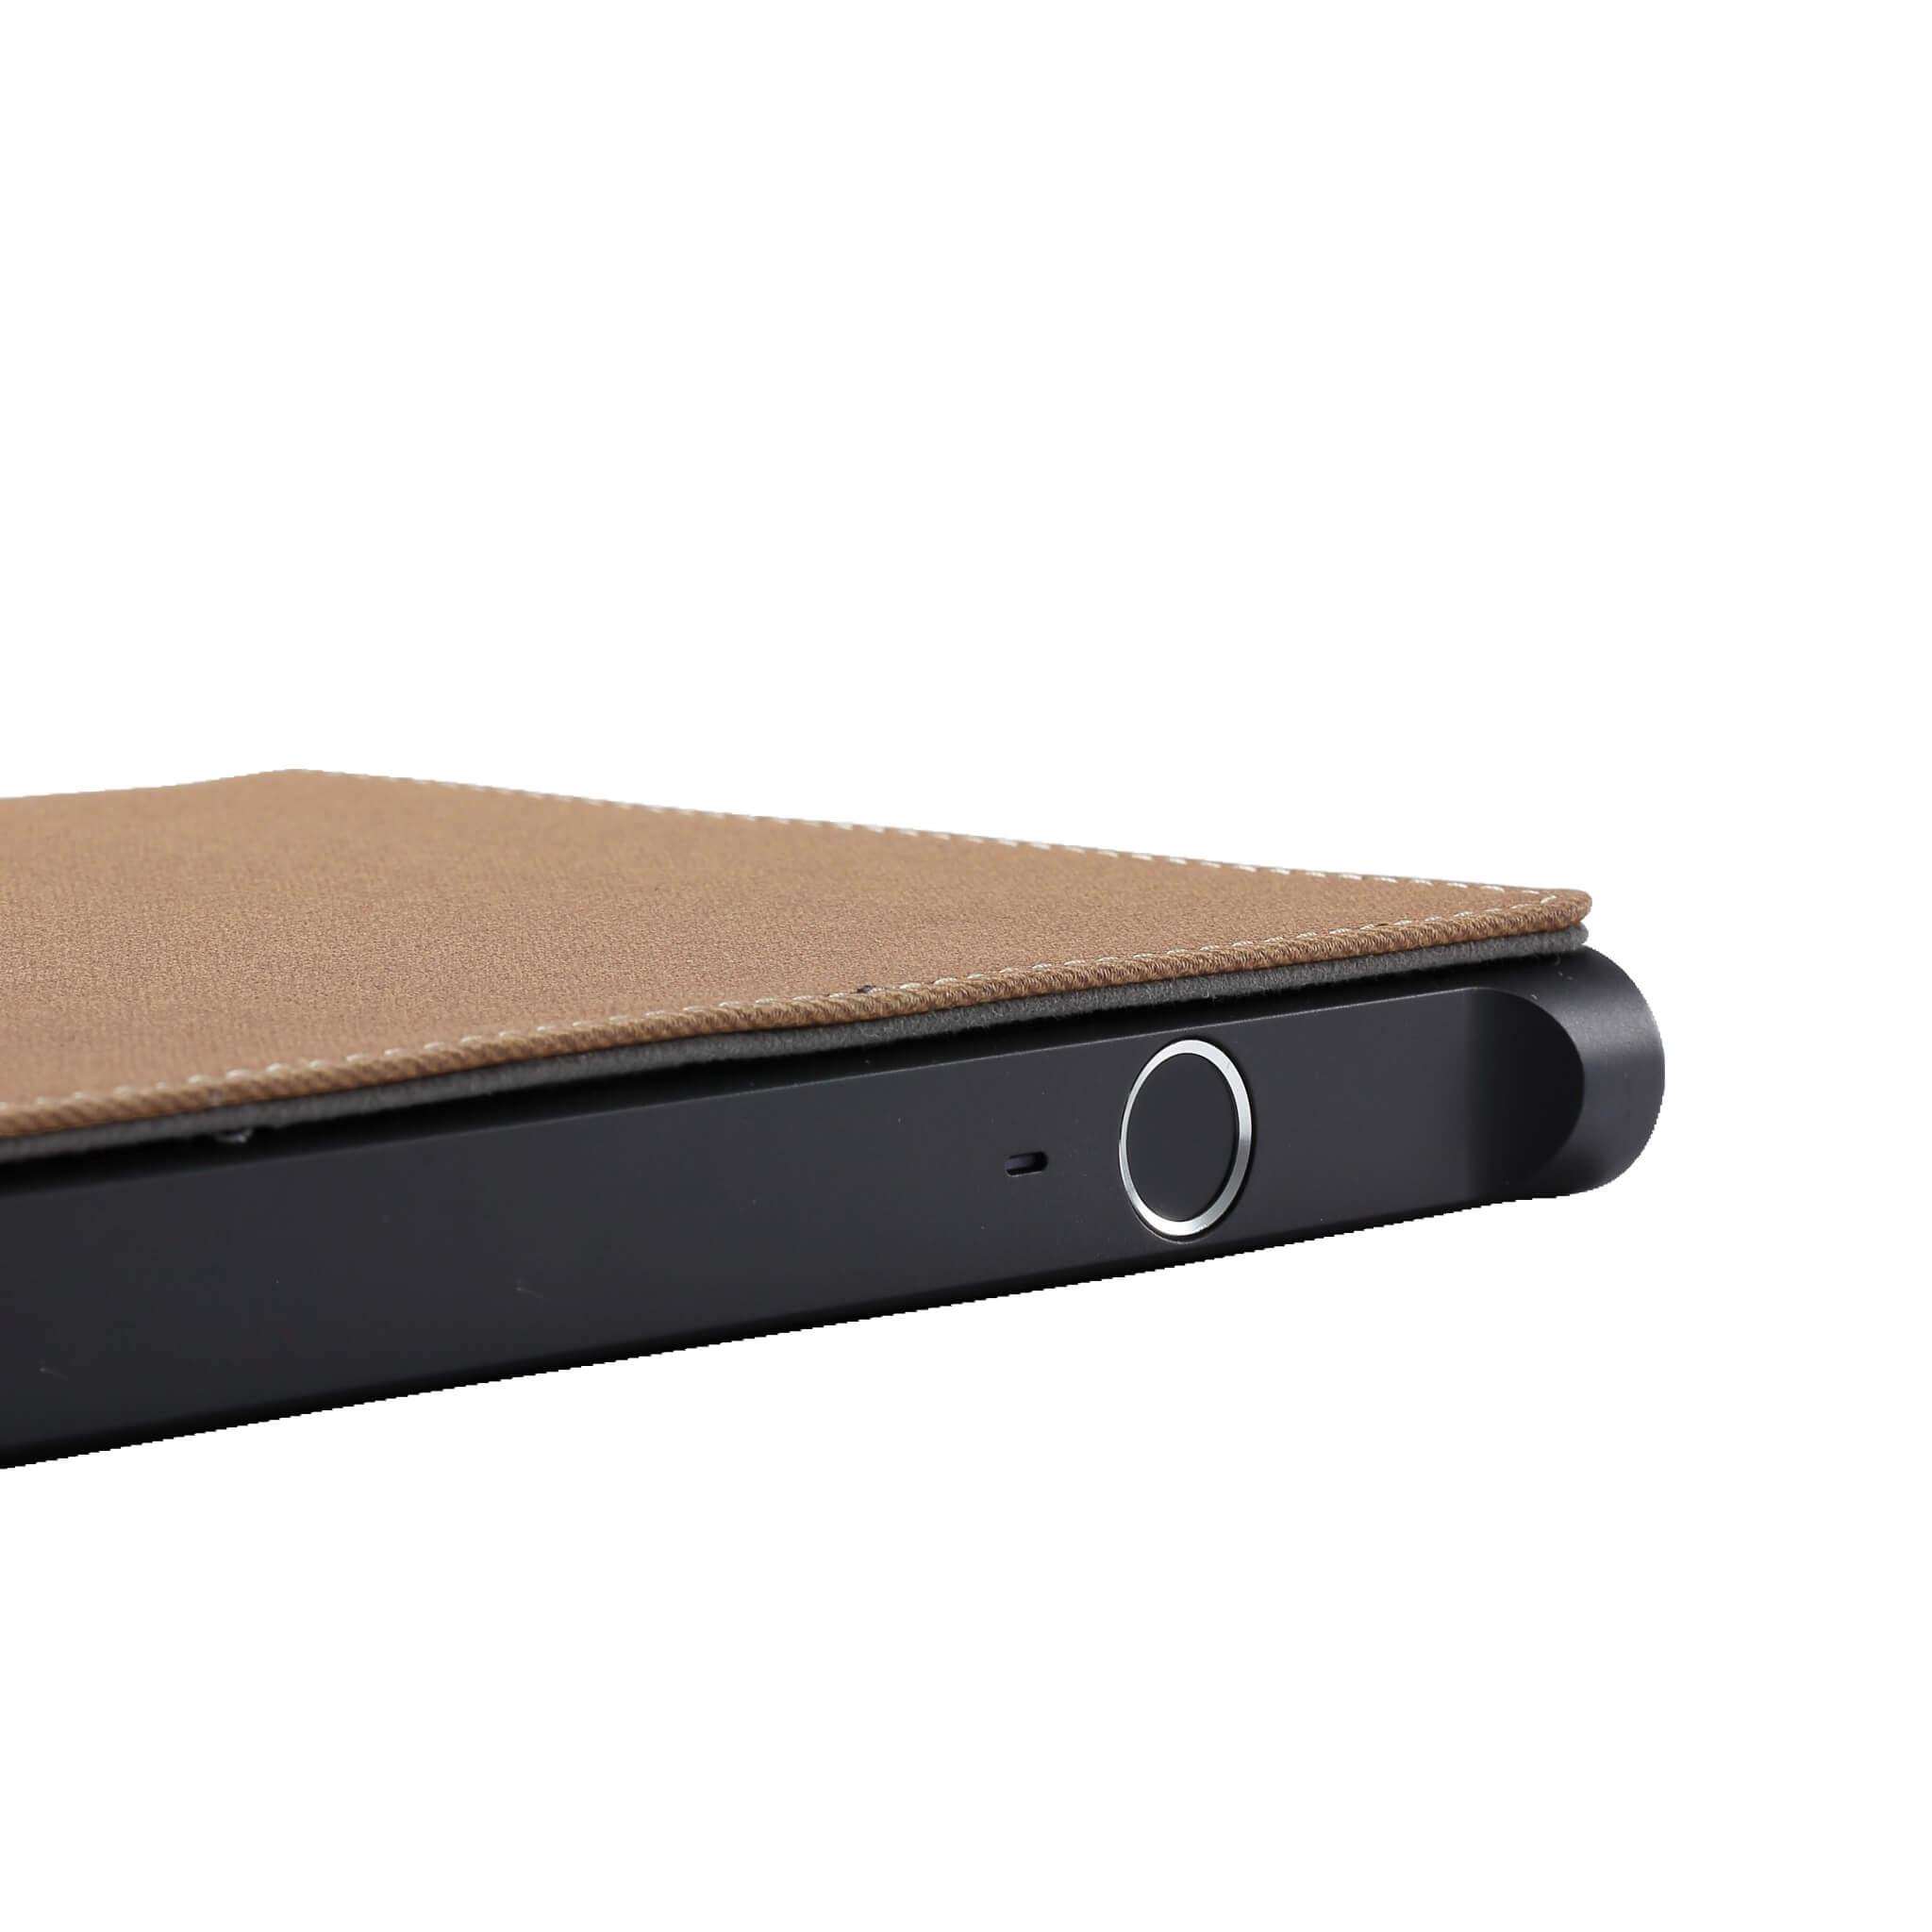 Khaki Fingerprint Smartbook book side | Midas Touch